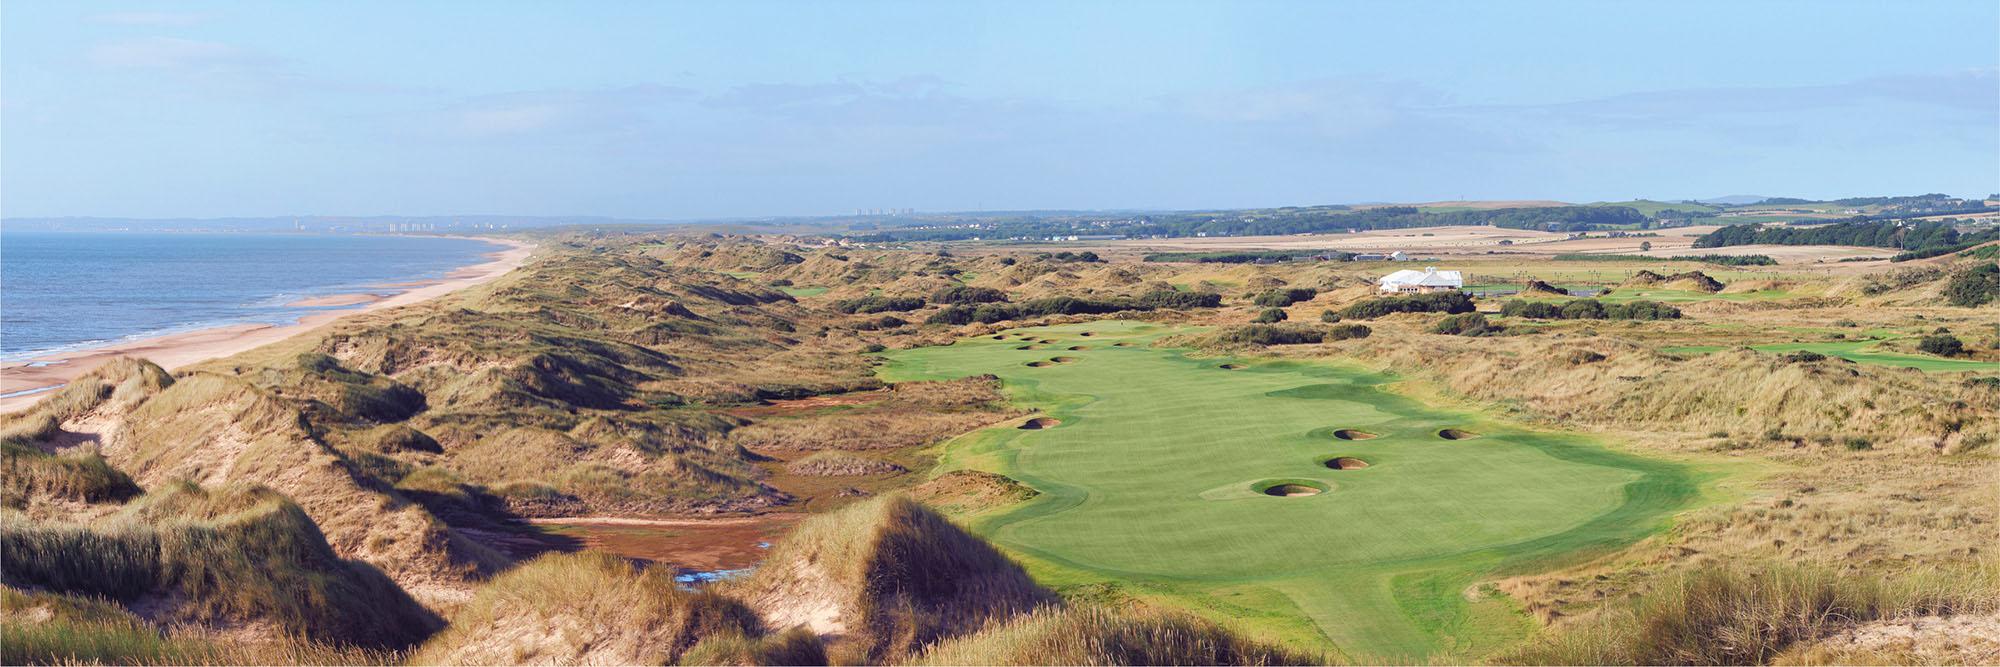 Golf Course Image - Trump International No. 18